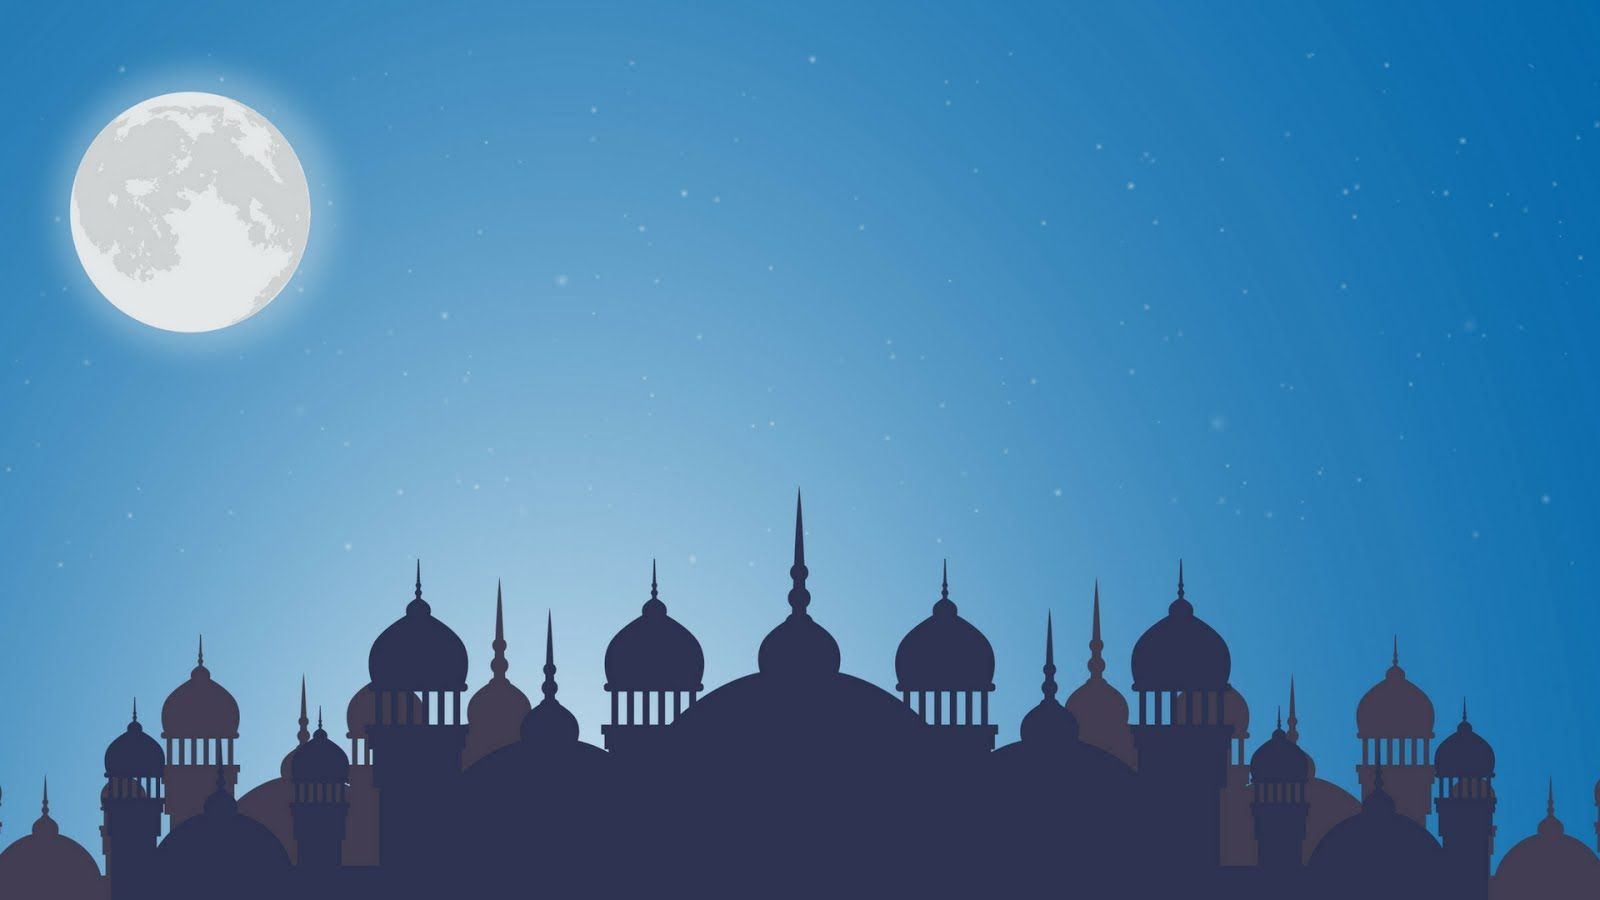 background ramadhan tiba in 2020 wallpaper ramadhan poster ramadhan ramadhan background ramadhan tiba in 2020